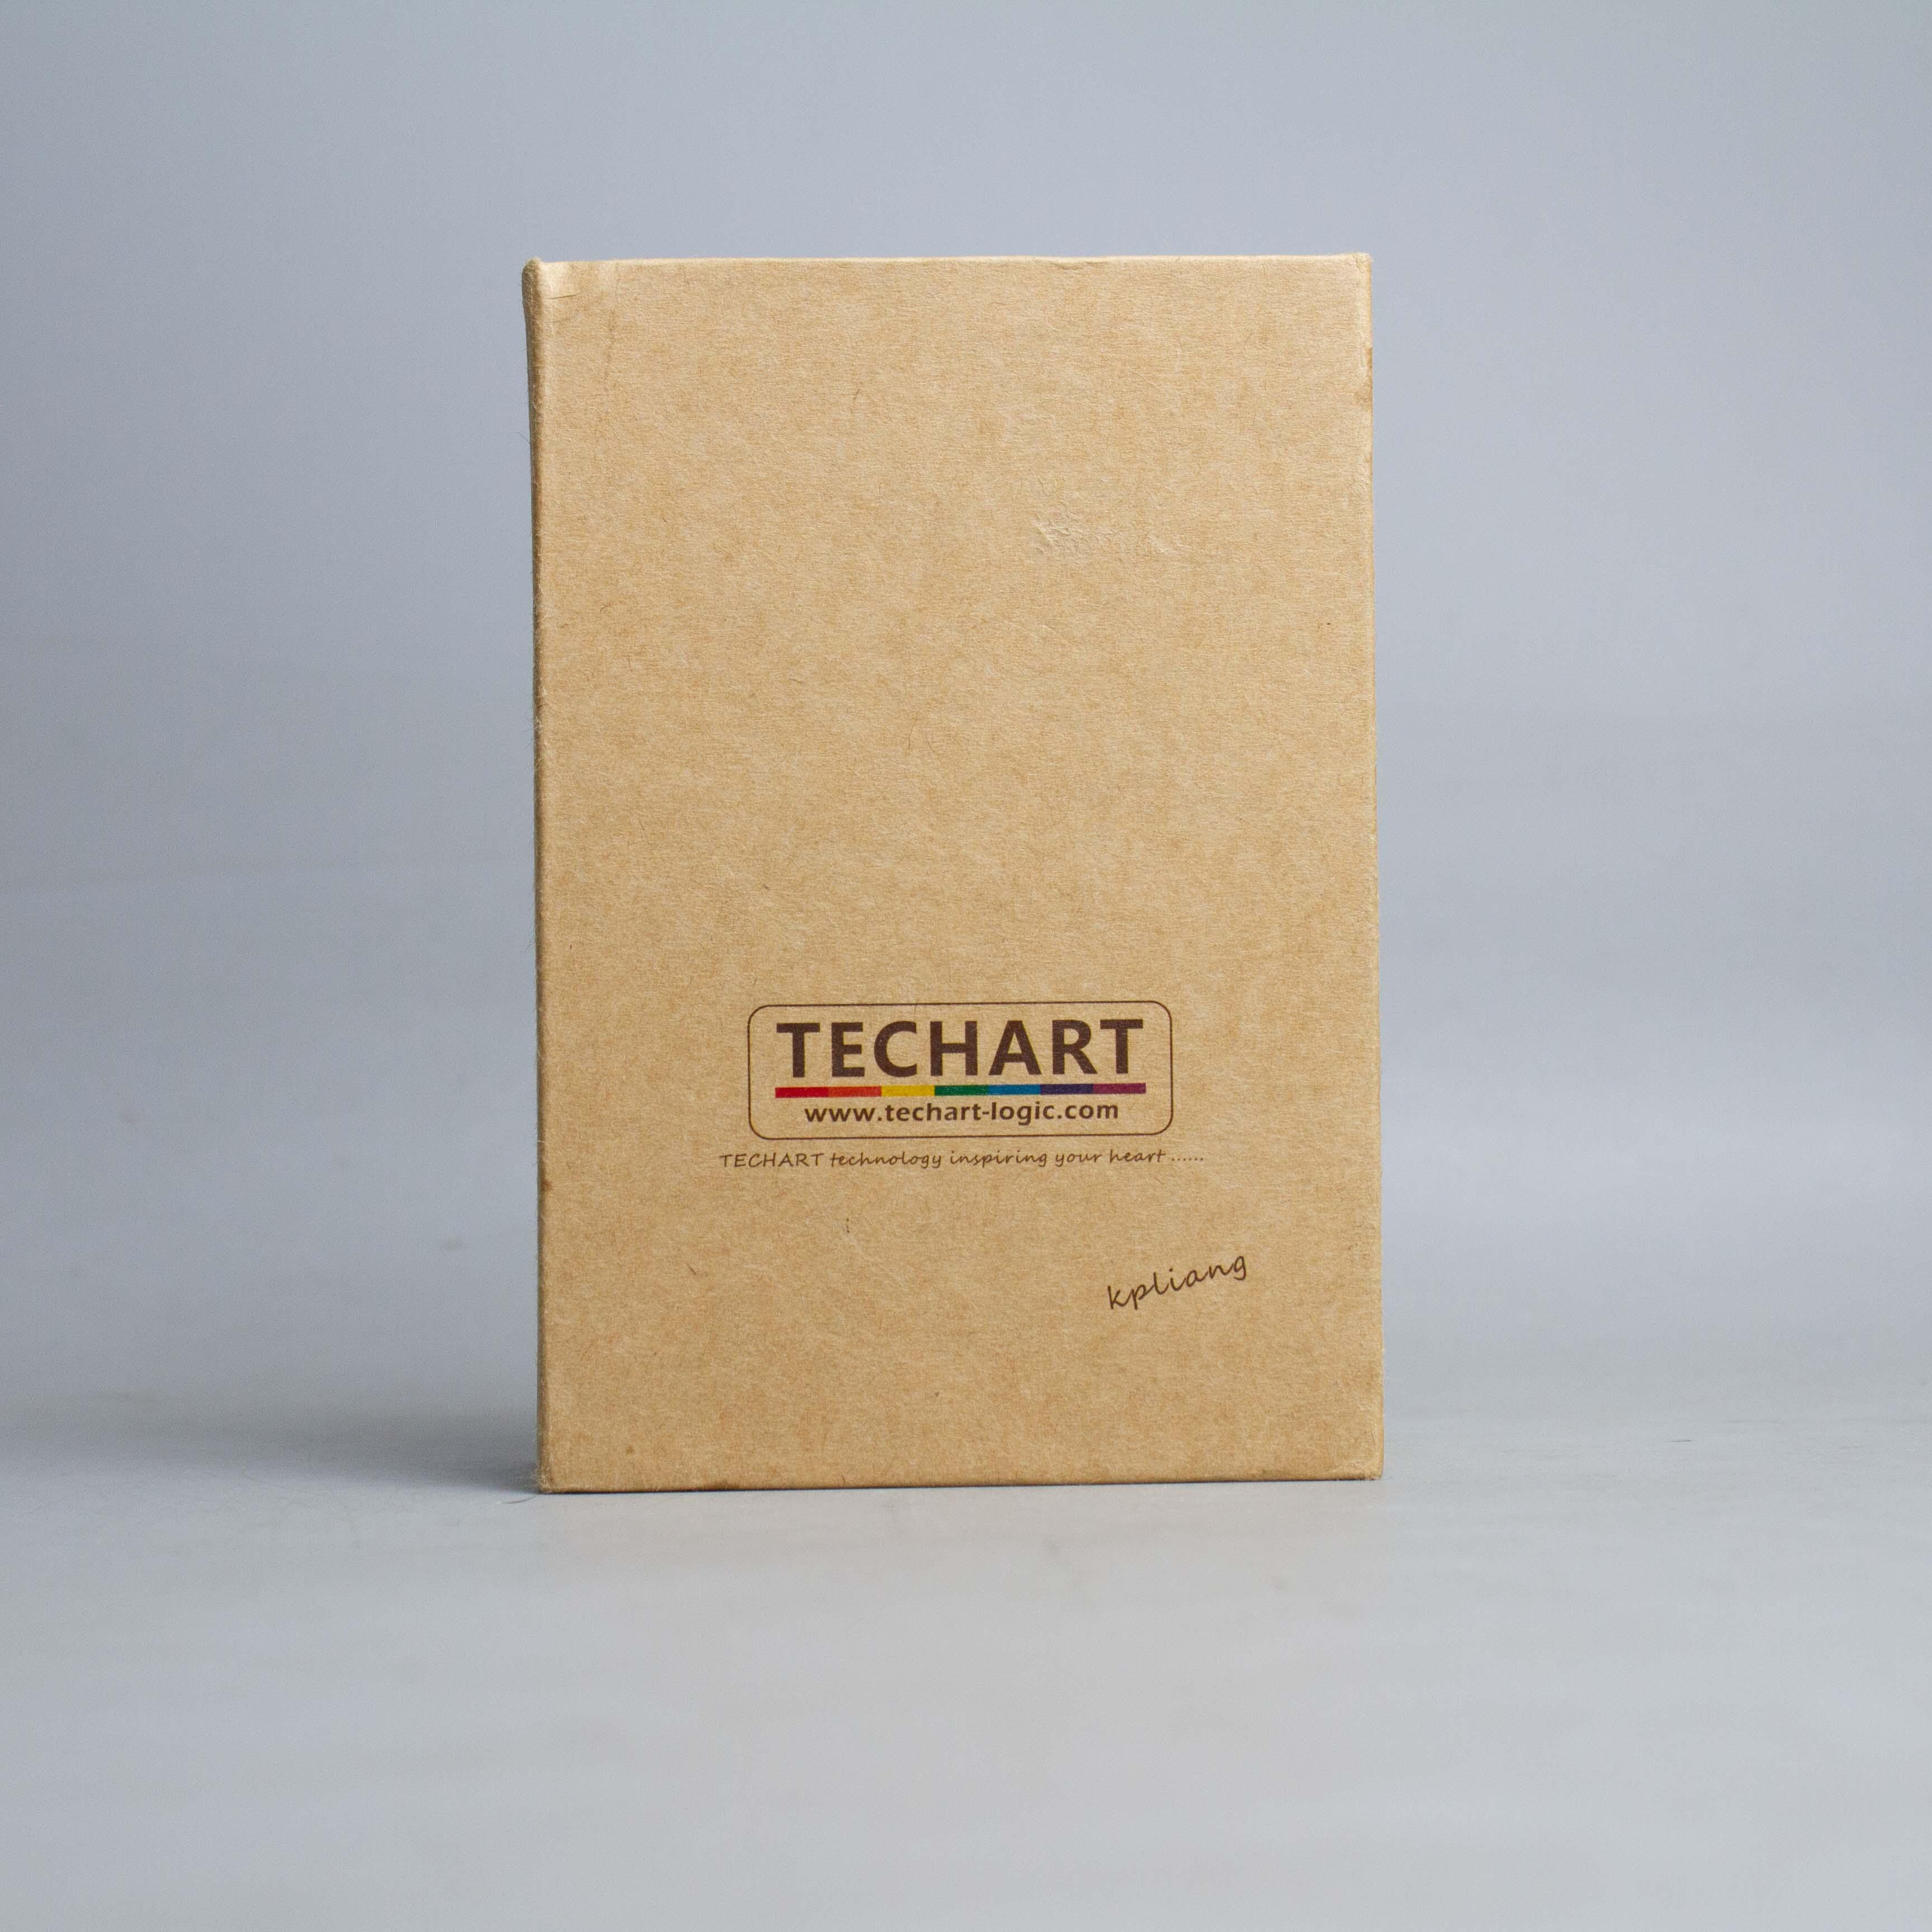 ngam-chuyen-techart-pro-lm-sony-17410